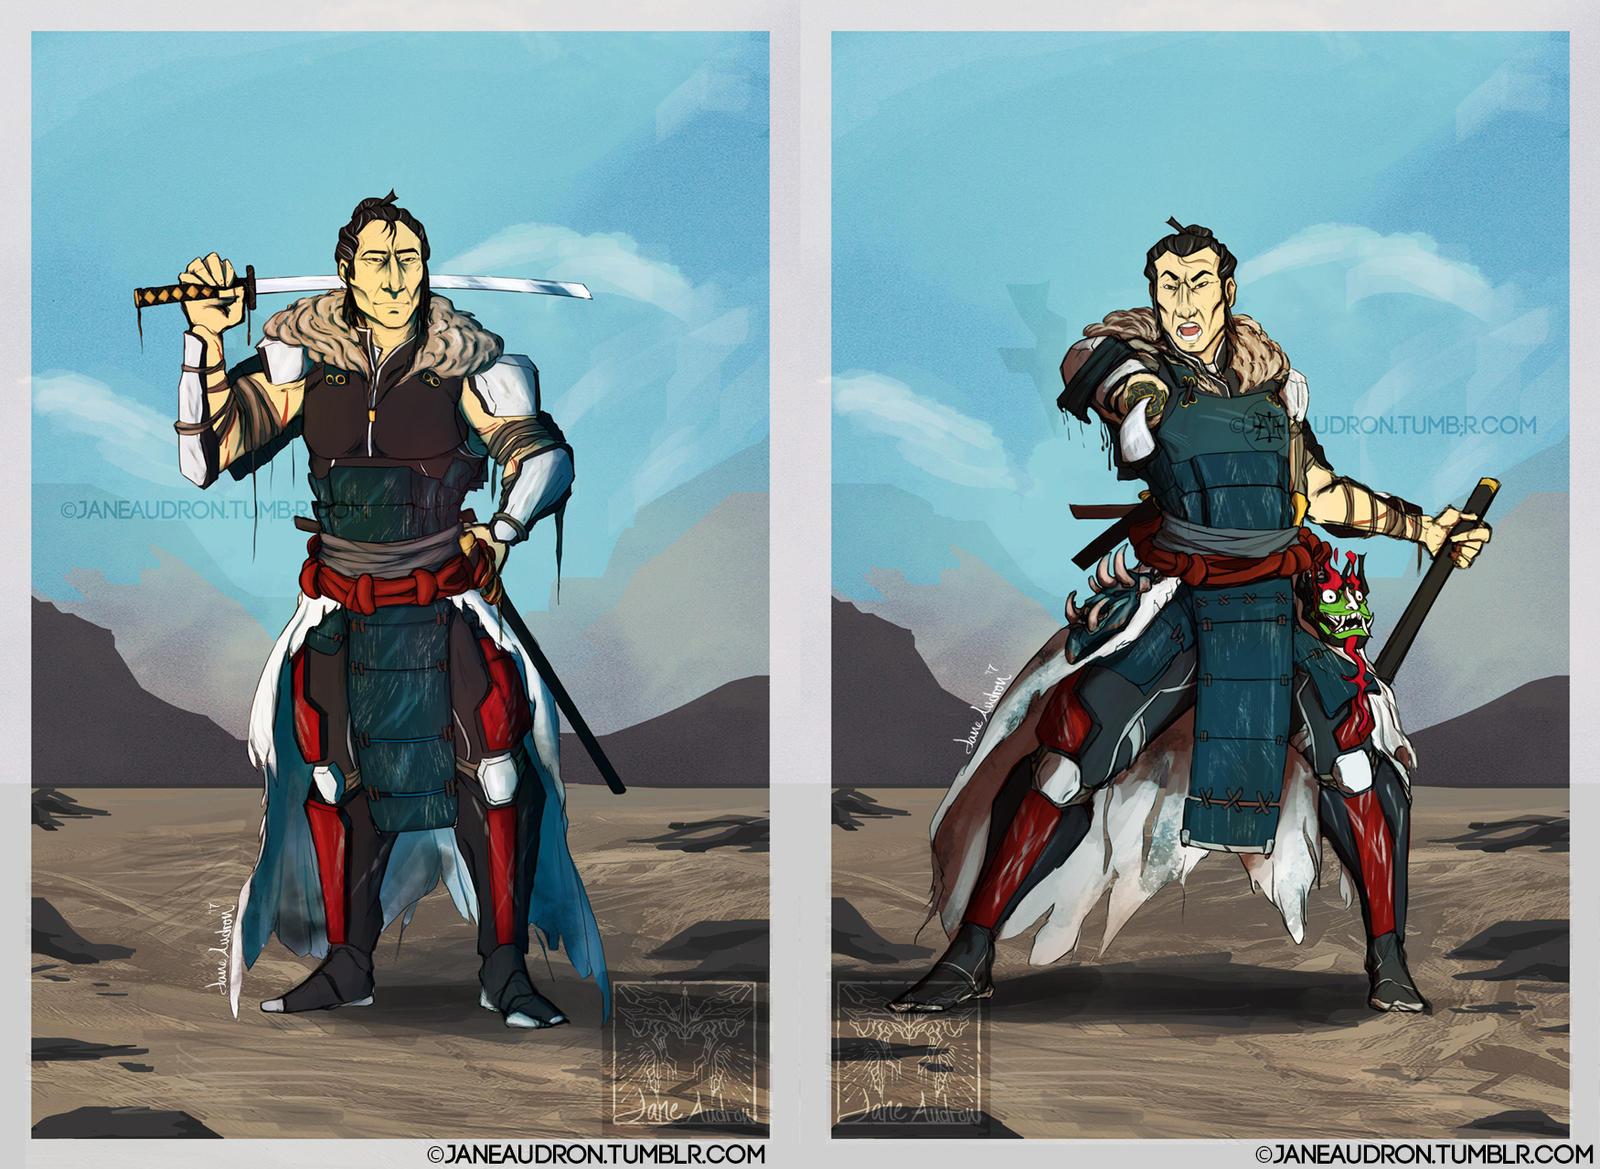 Illust. Proj. 2 - XCOM Samurai Jack(Colored) by Jane2Audron